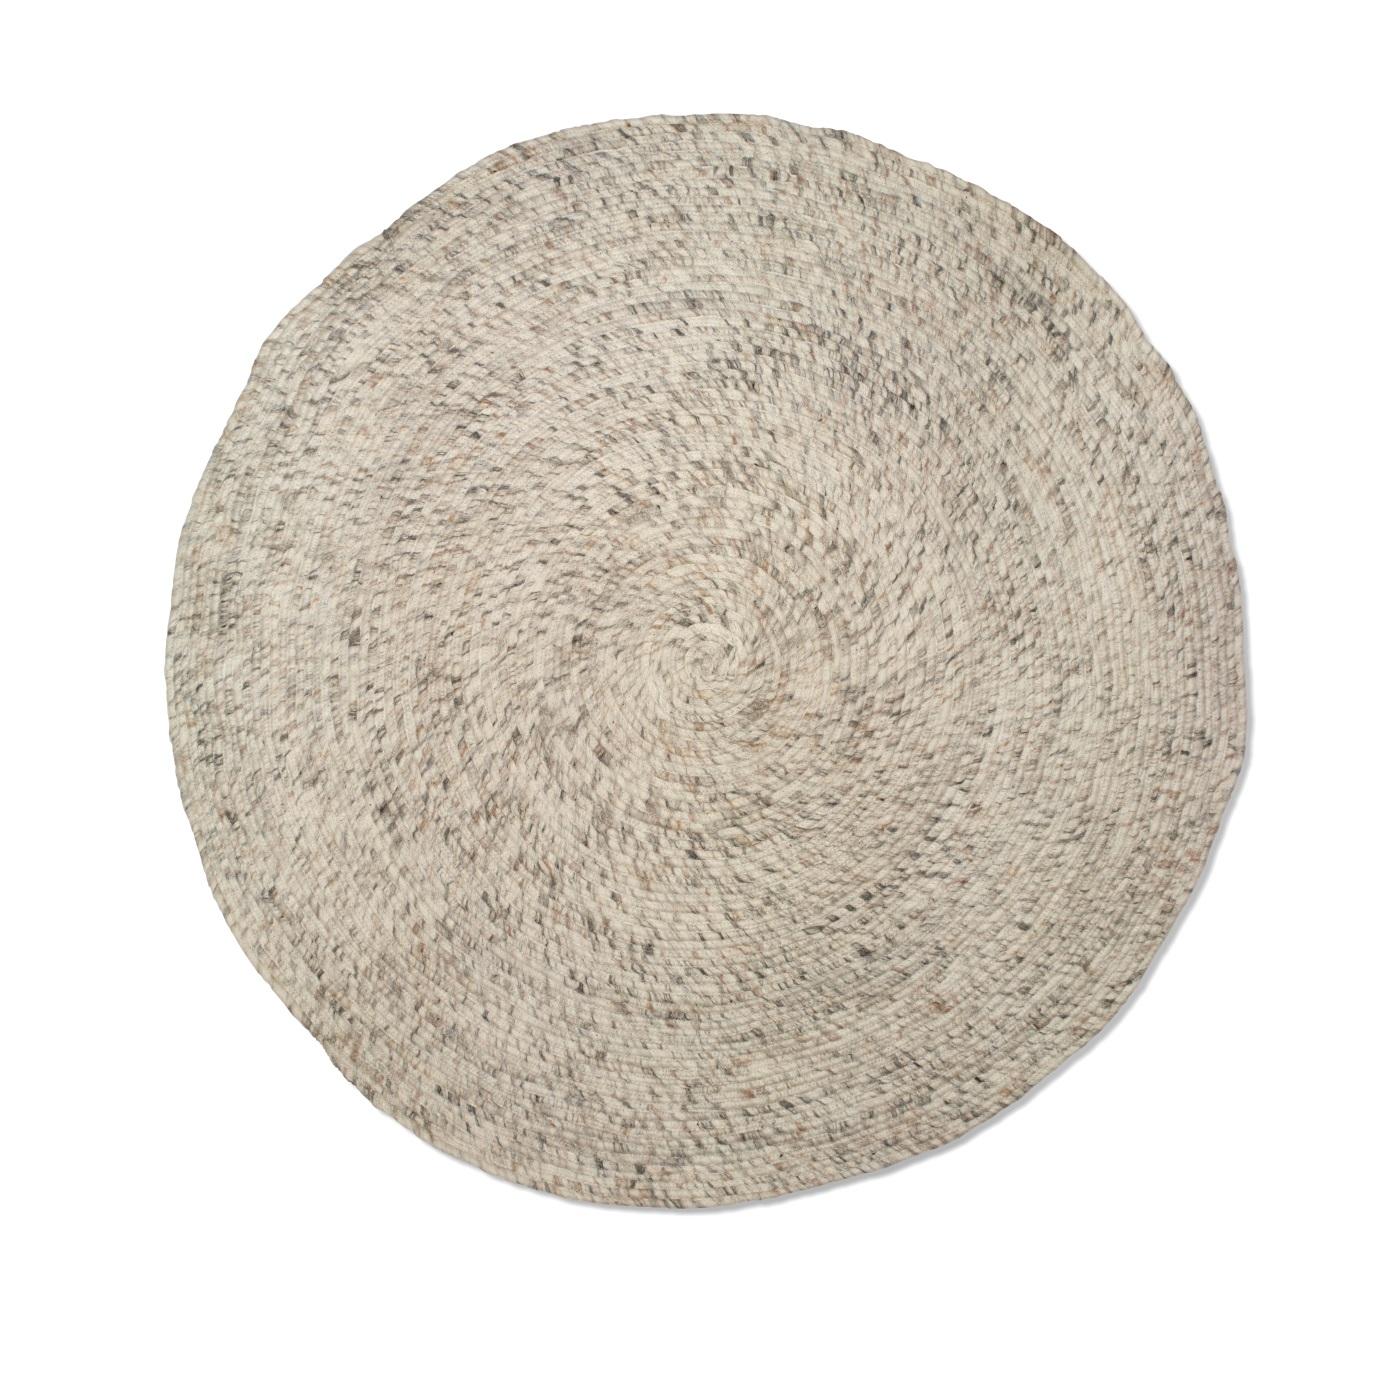 Rund ullmatta Merino beige 160 cm, Classic Collection